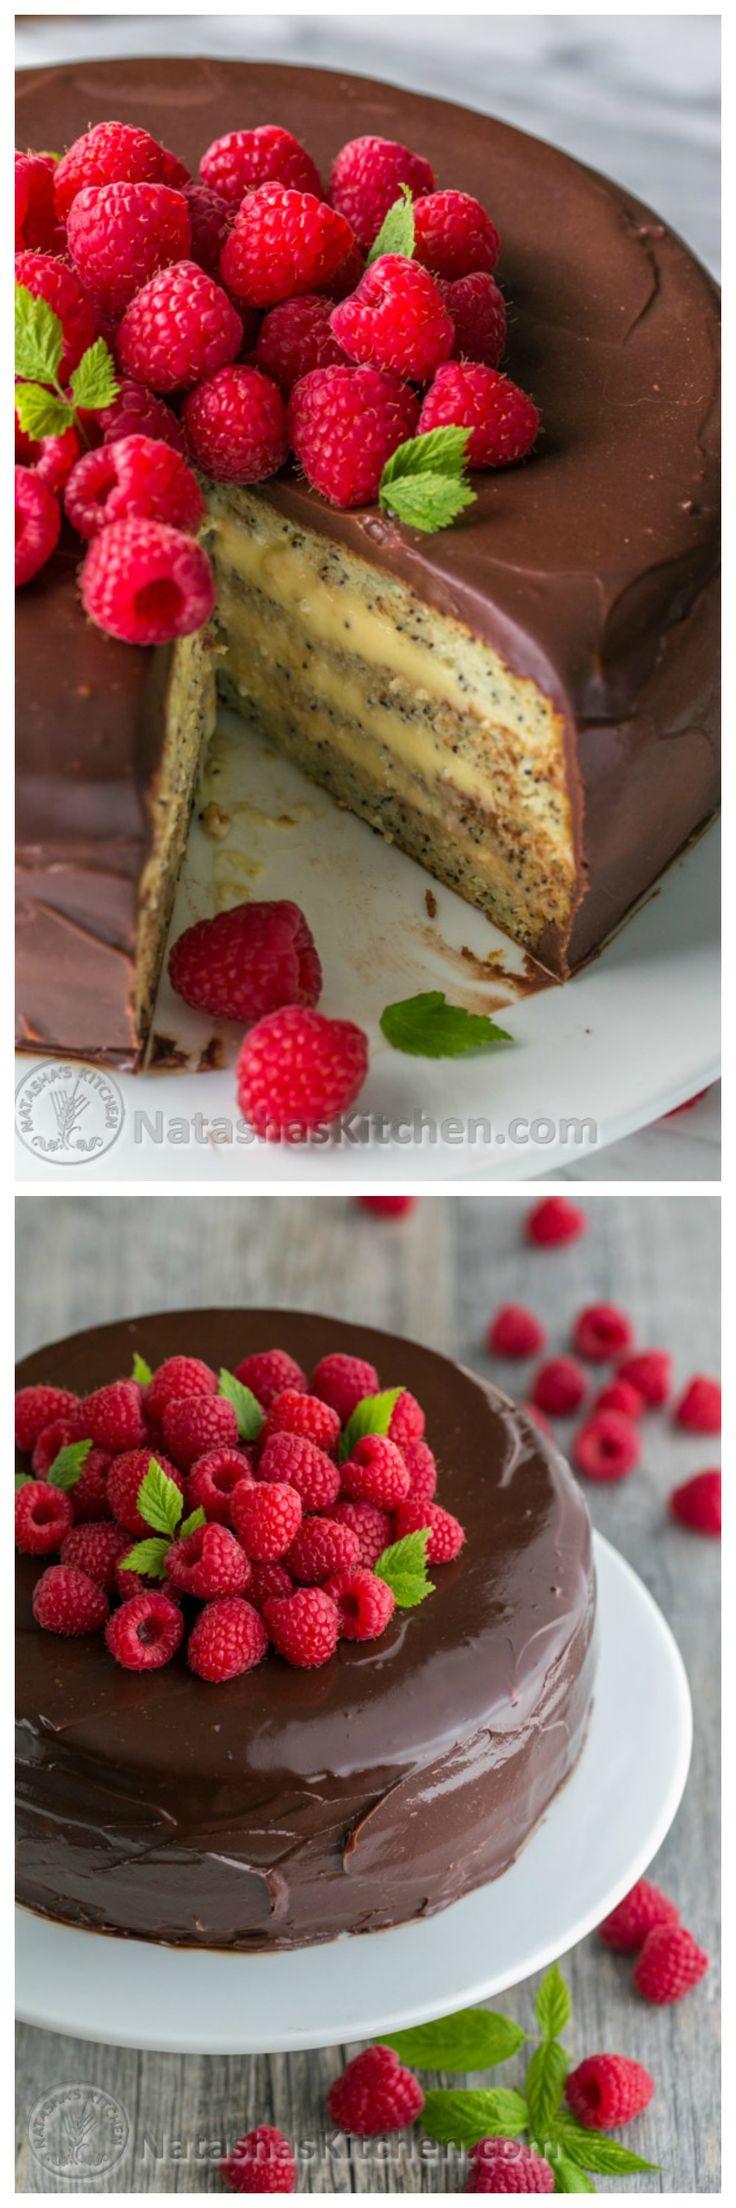 Best 25+ Sour cream chocolate cake ideas on Pinterest | Chocolate ...